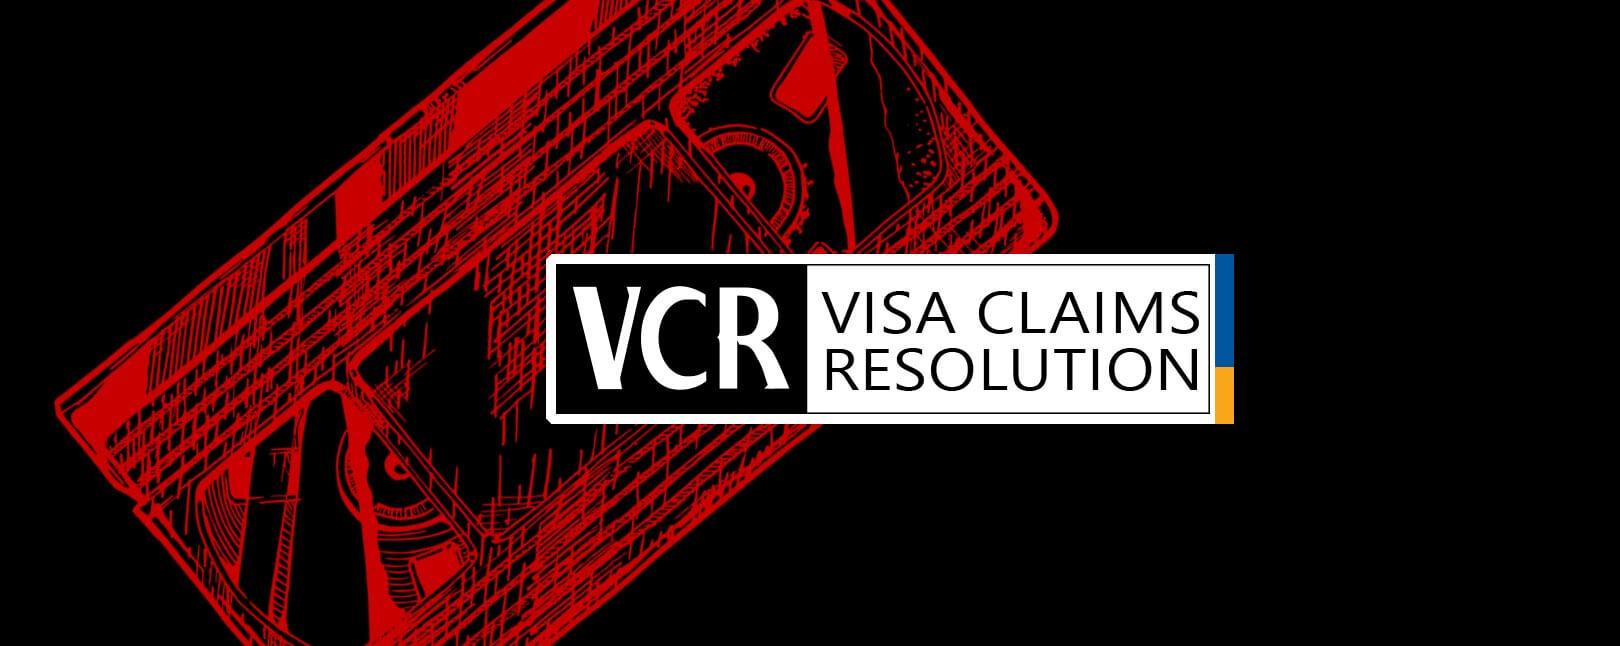 Visa Claims Resolution